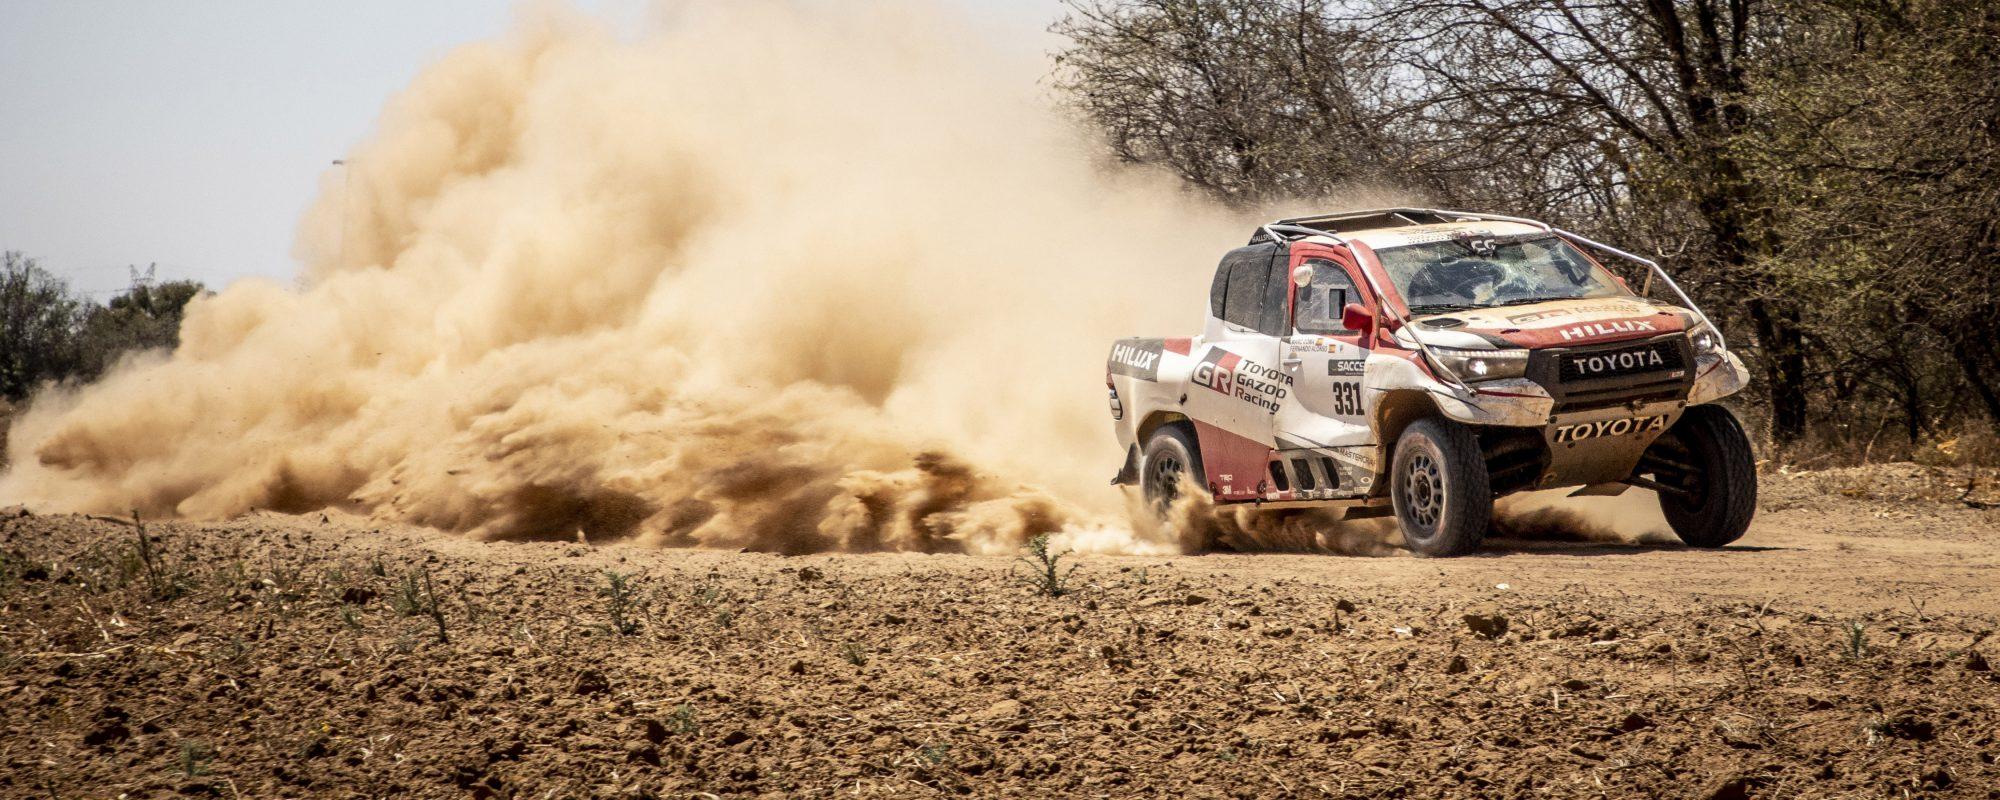 Fernando Alonso en Marc Coma trotseren uitdagende zware rallyproef in Zuid-Afrika